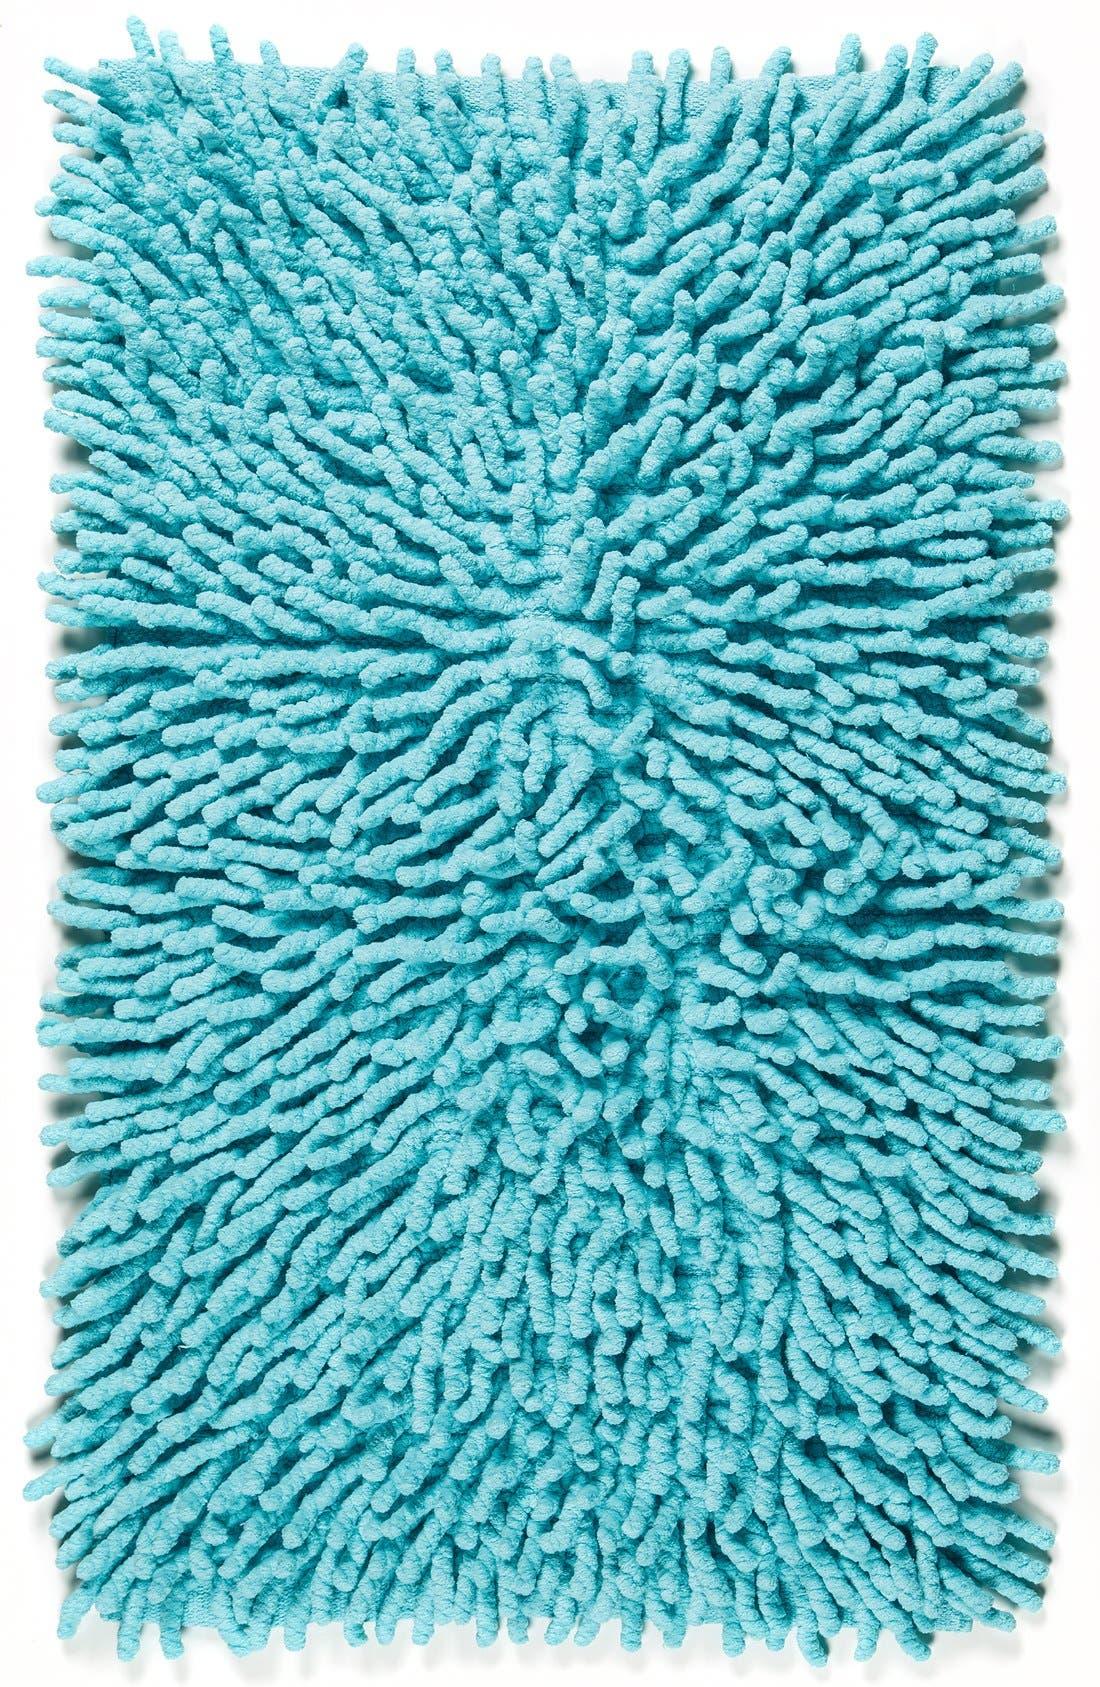 Kassatex Bambini Basics Shag Chenille Cotton Bath Rug